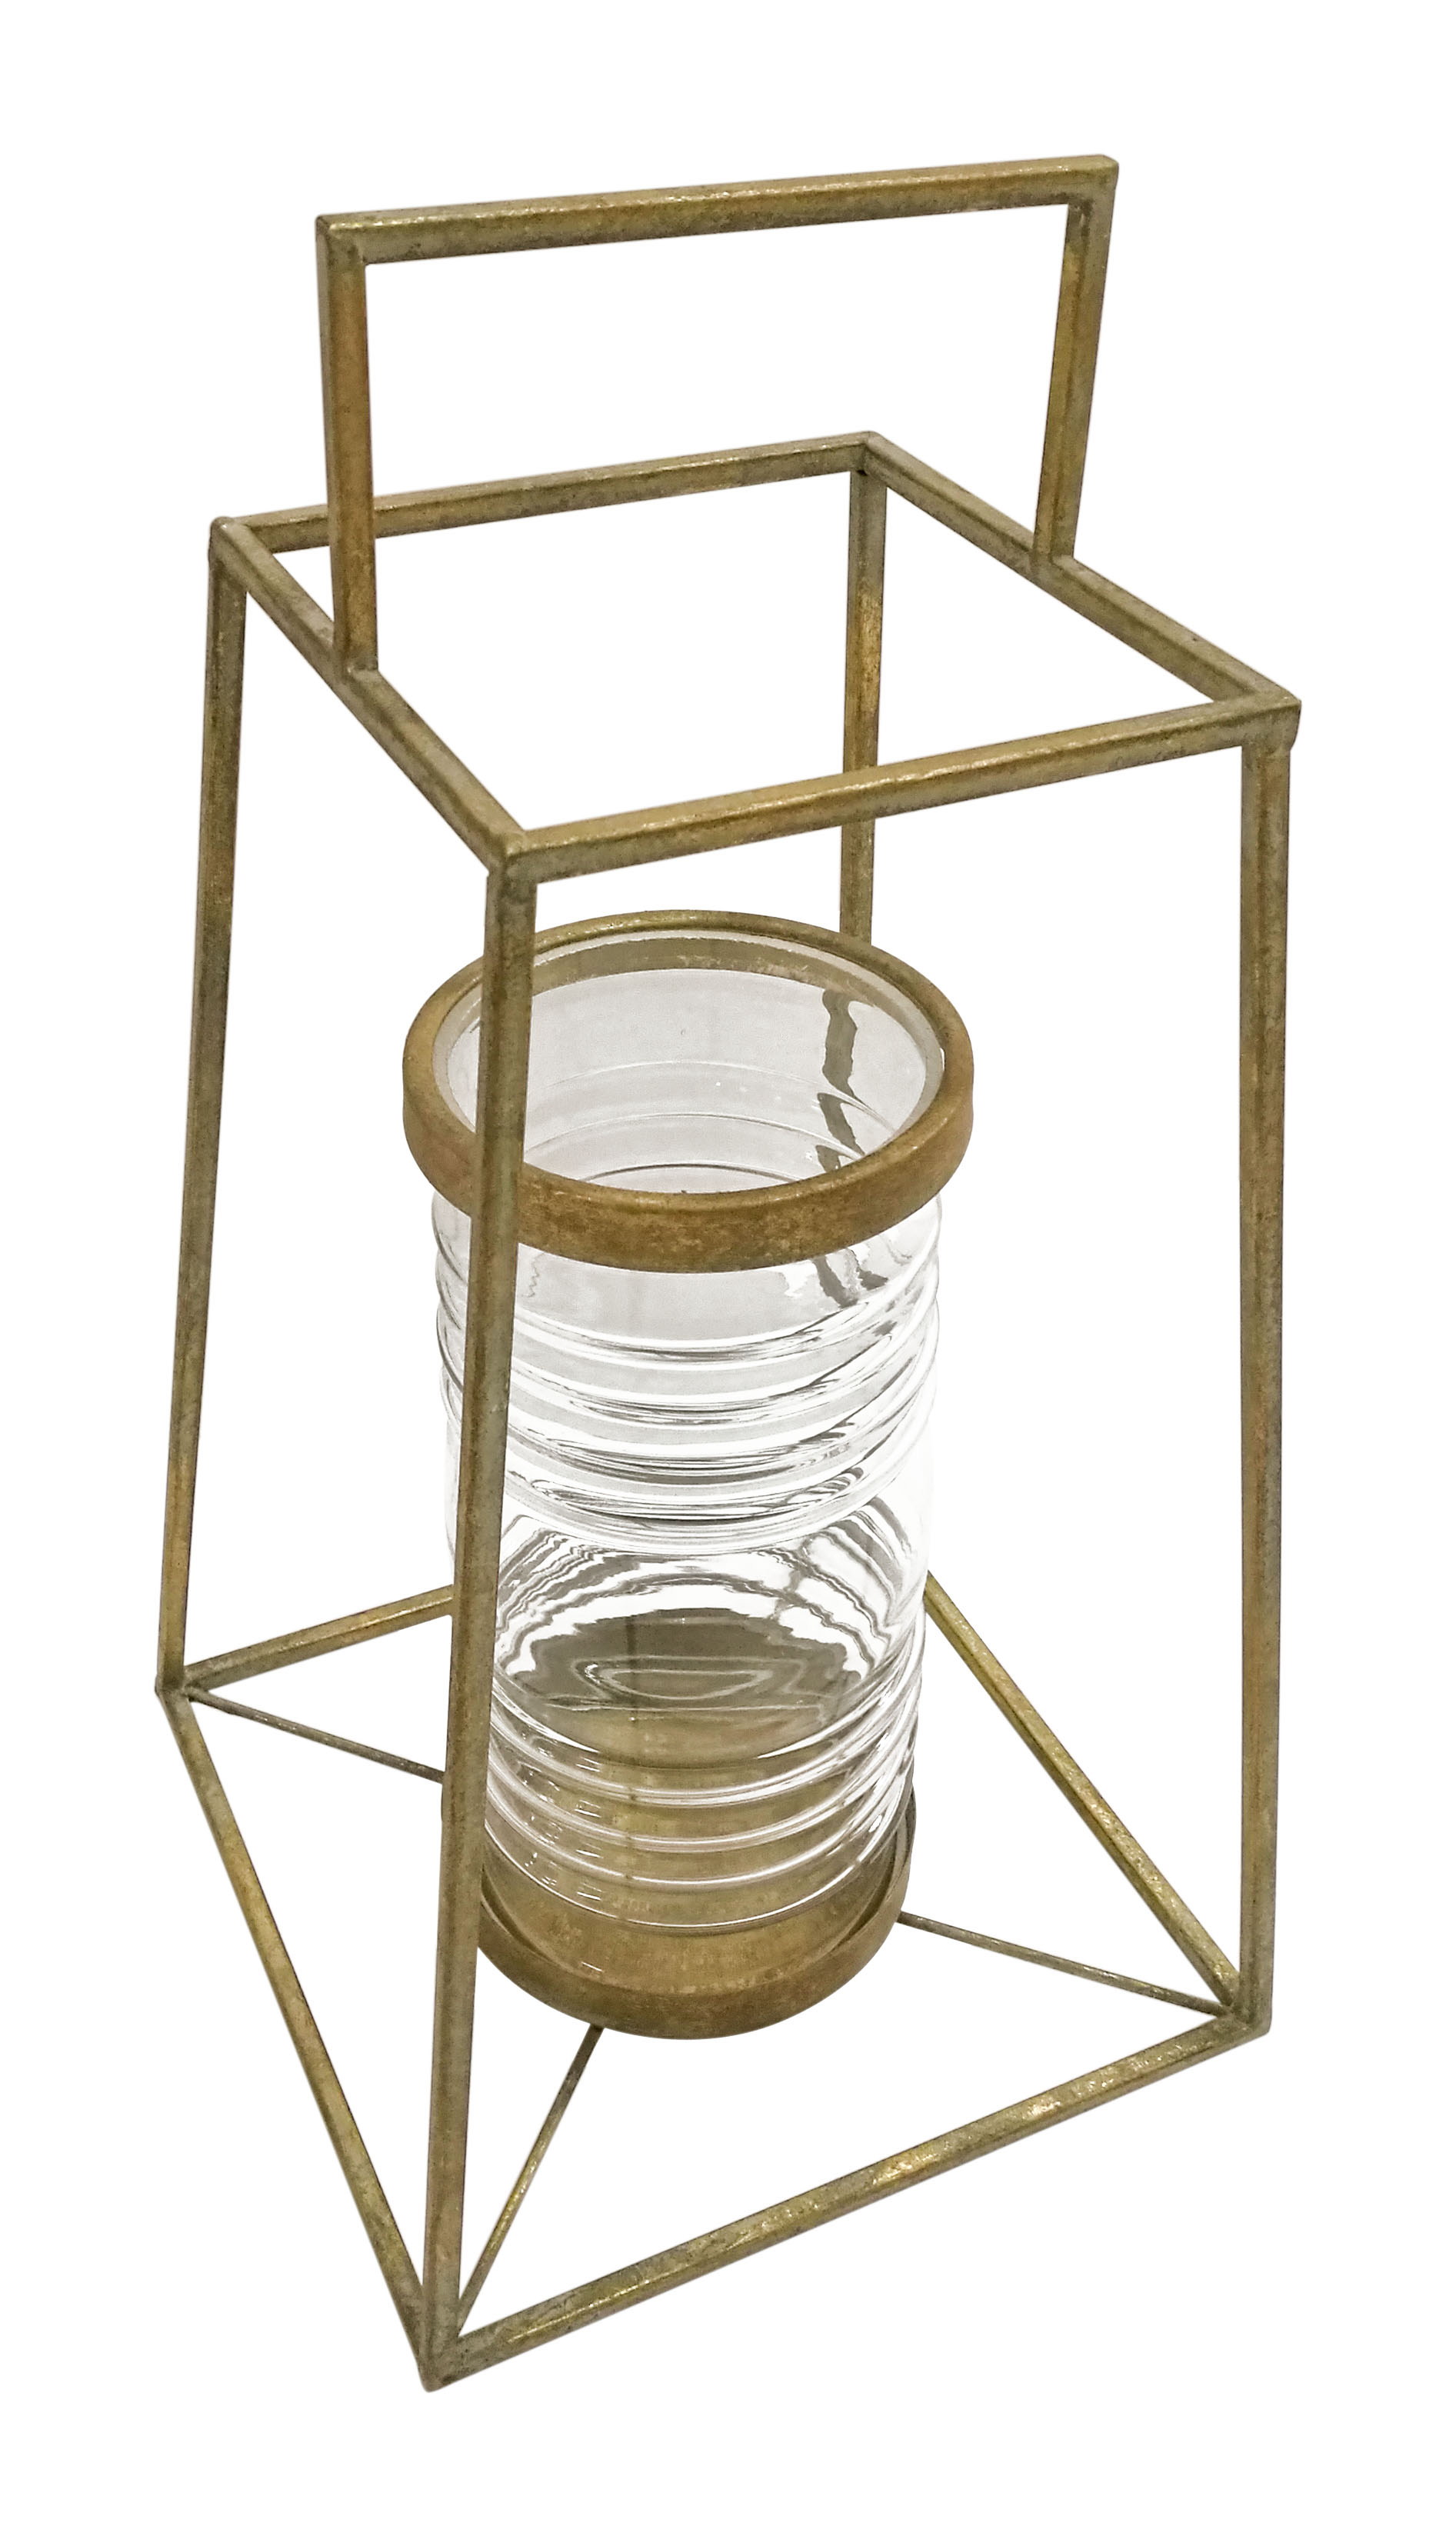 "10"" X 20"" X 10"" Large Antique Gold Pyramid Lantern"